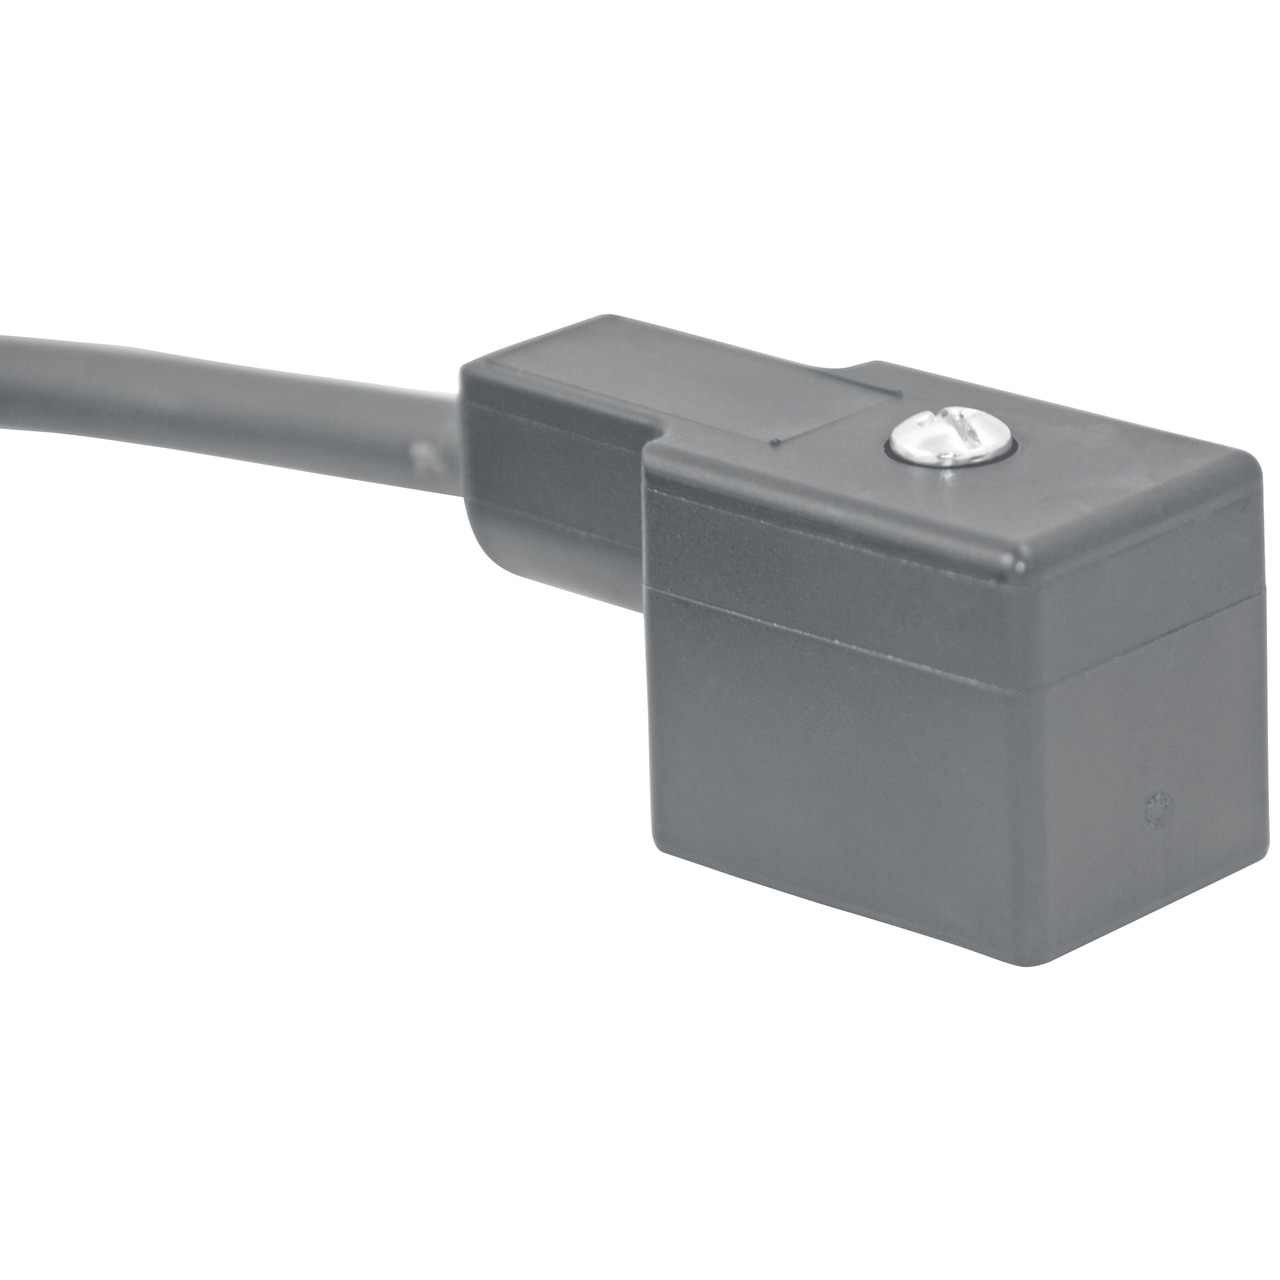 Precon Gerätestecker B-612-202-0162-2000- mit 2-m-Kabel